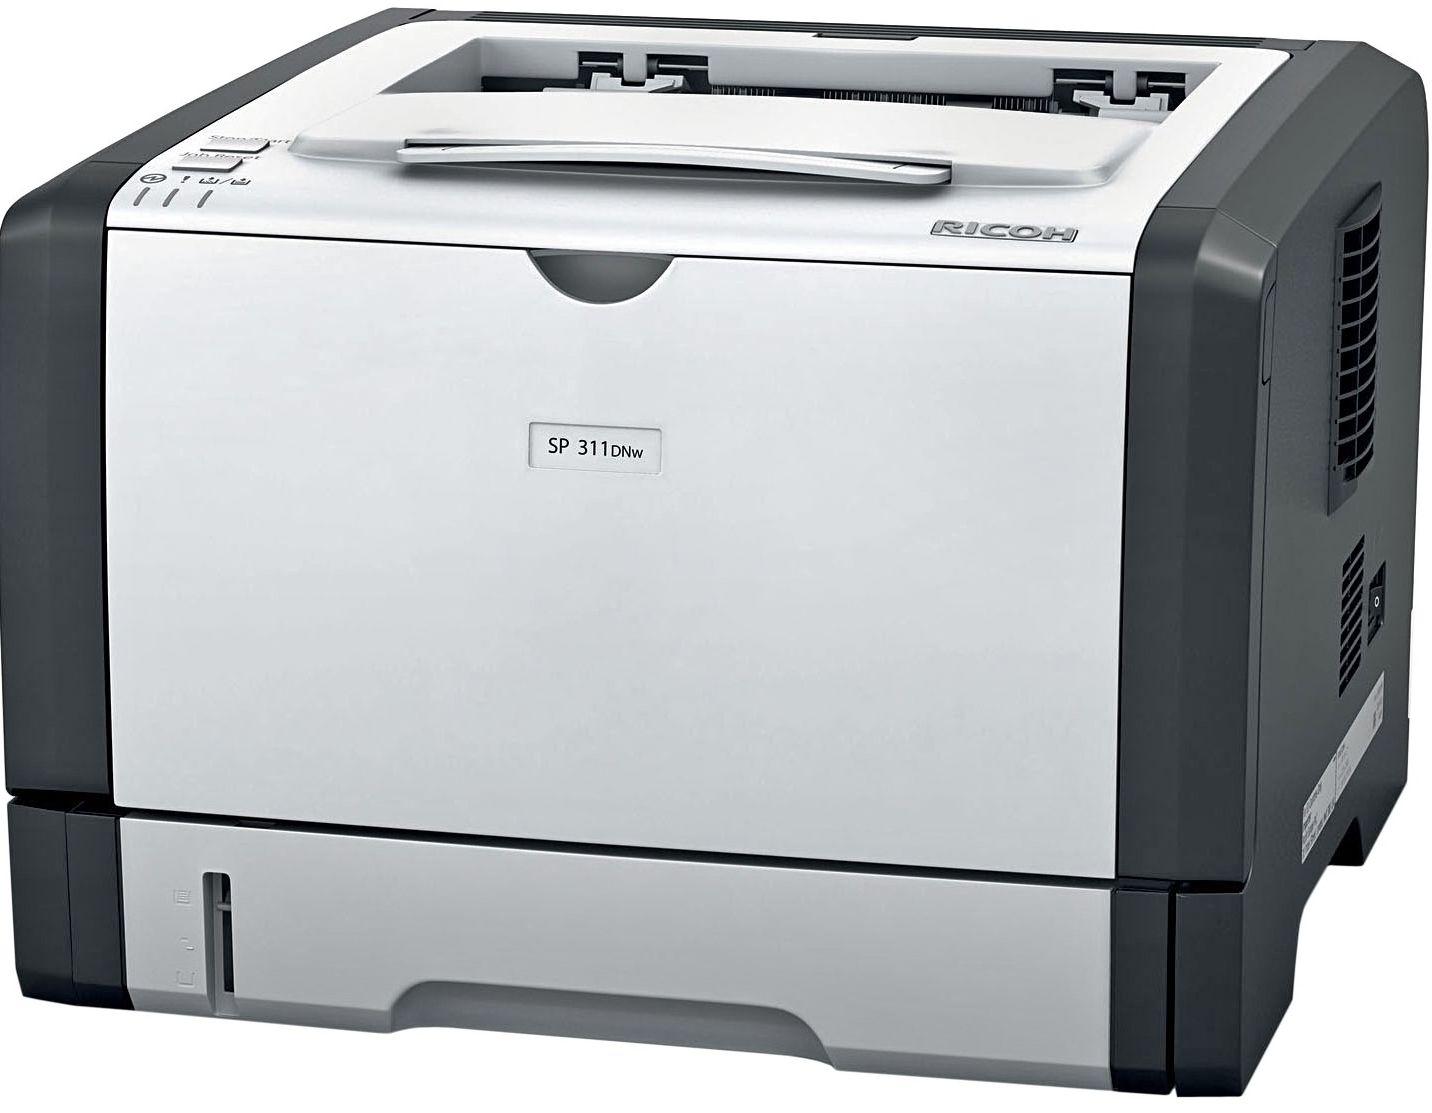 Ricoh SP 311DNw  - лазерный принтер